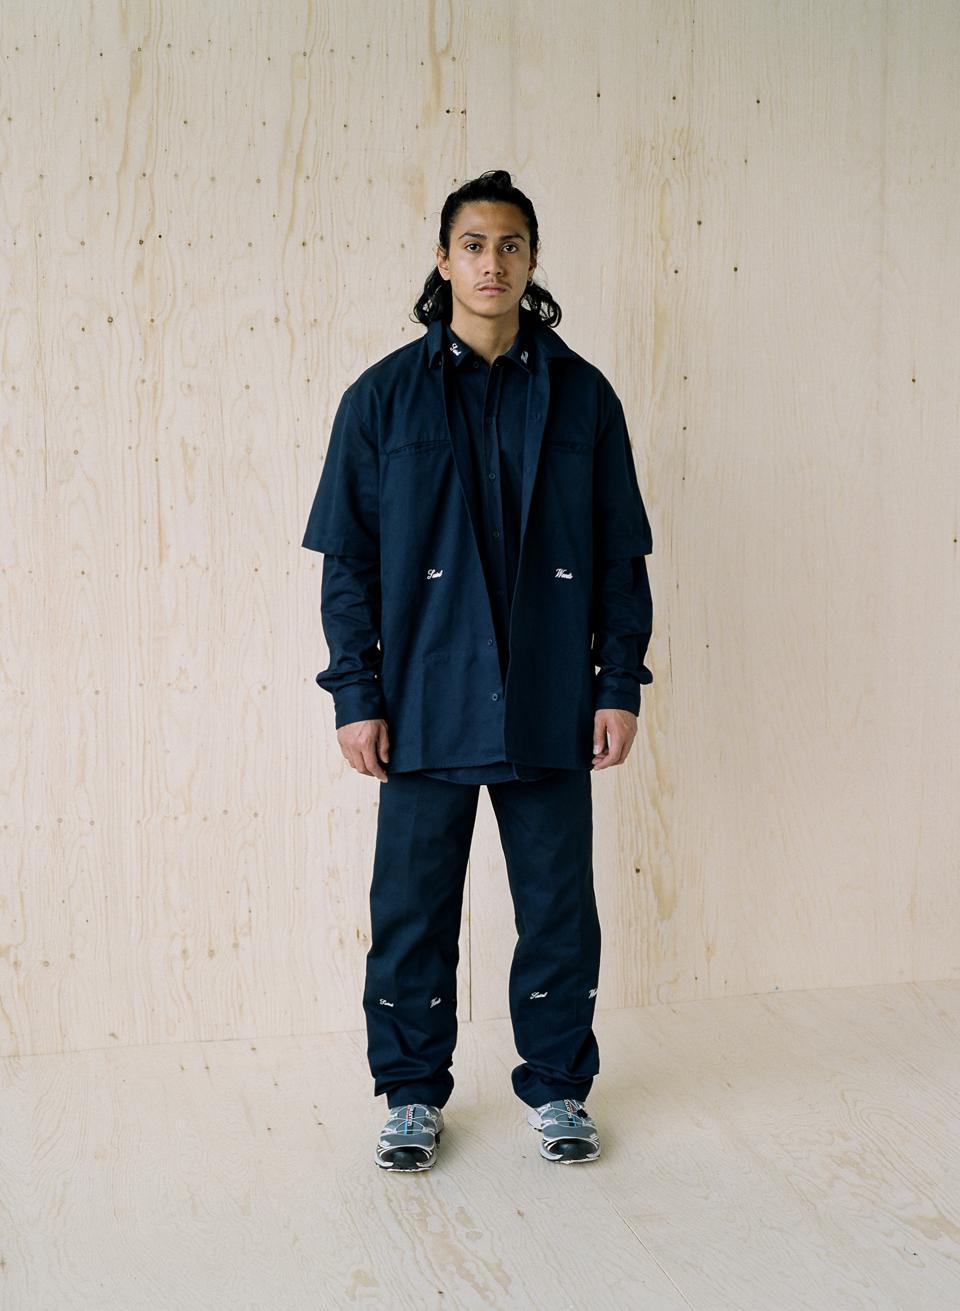 Saintwoods 3-Piece Workwear Suit